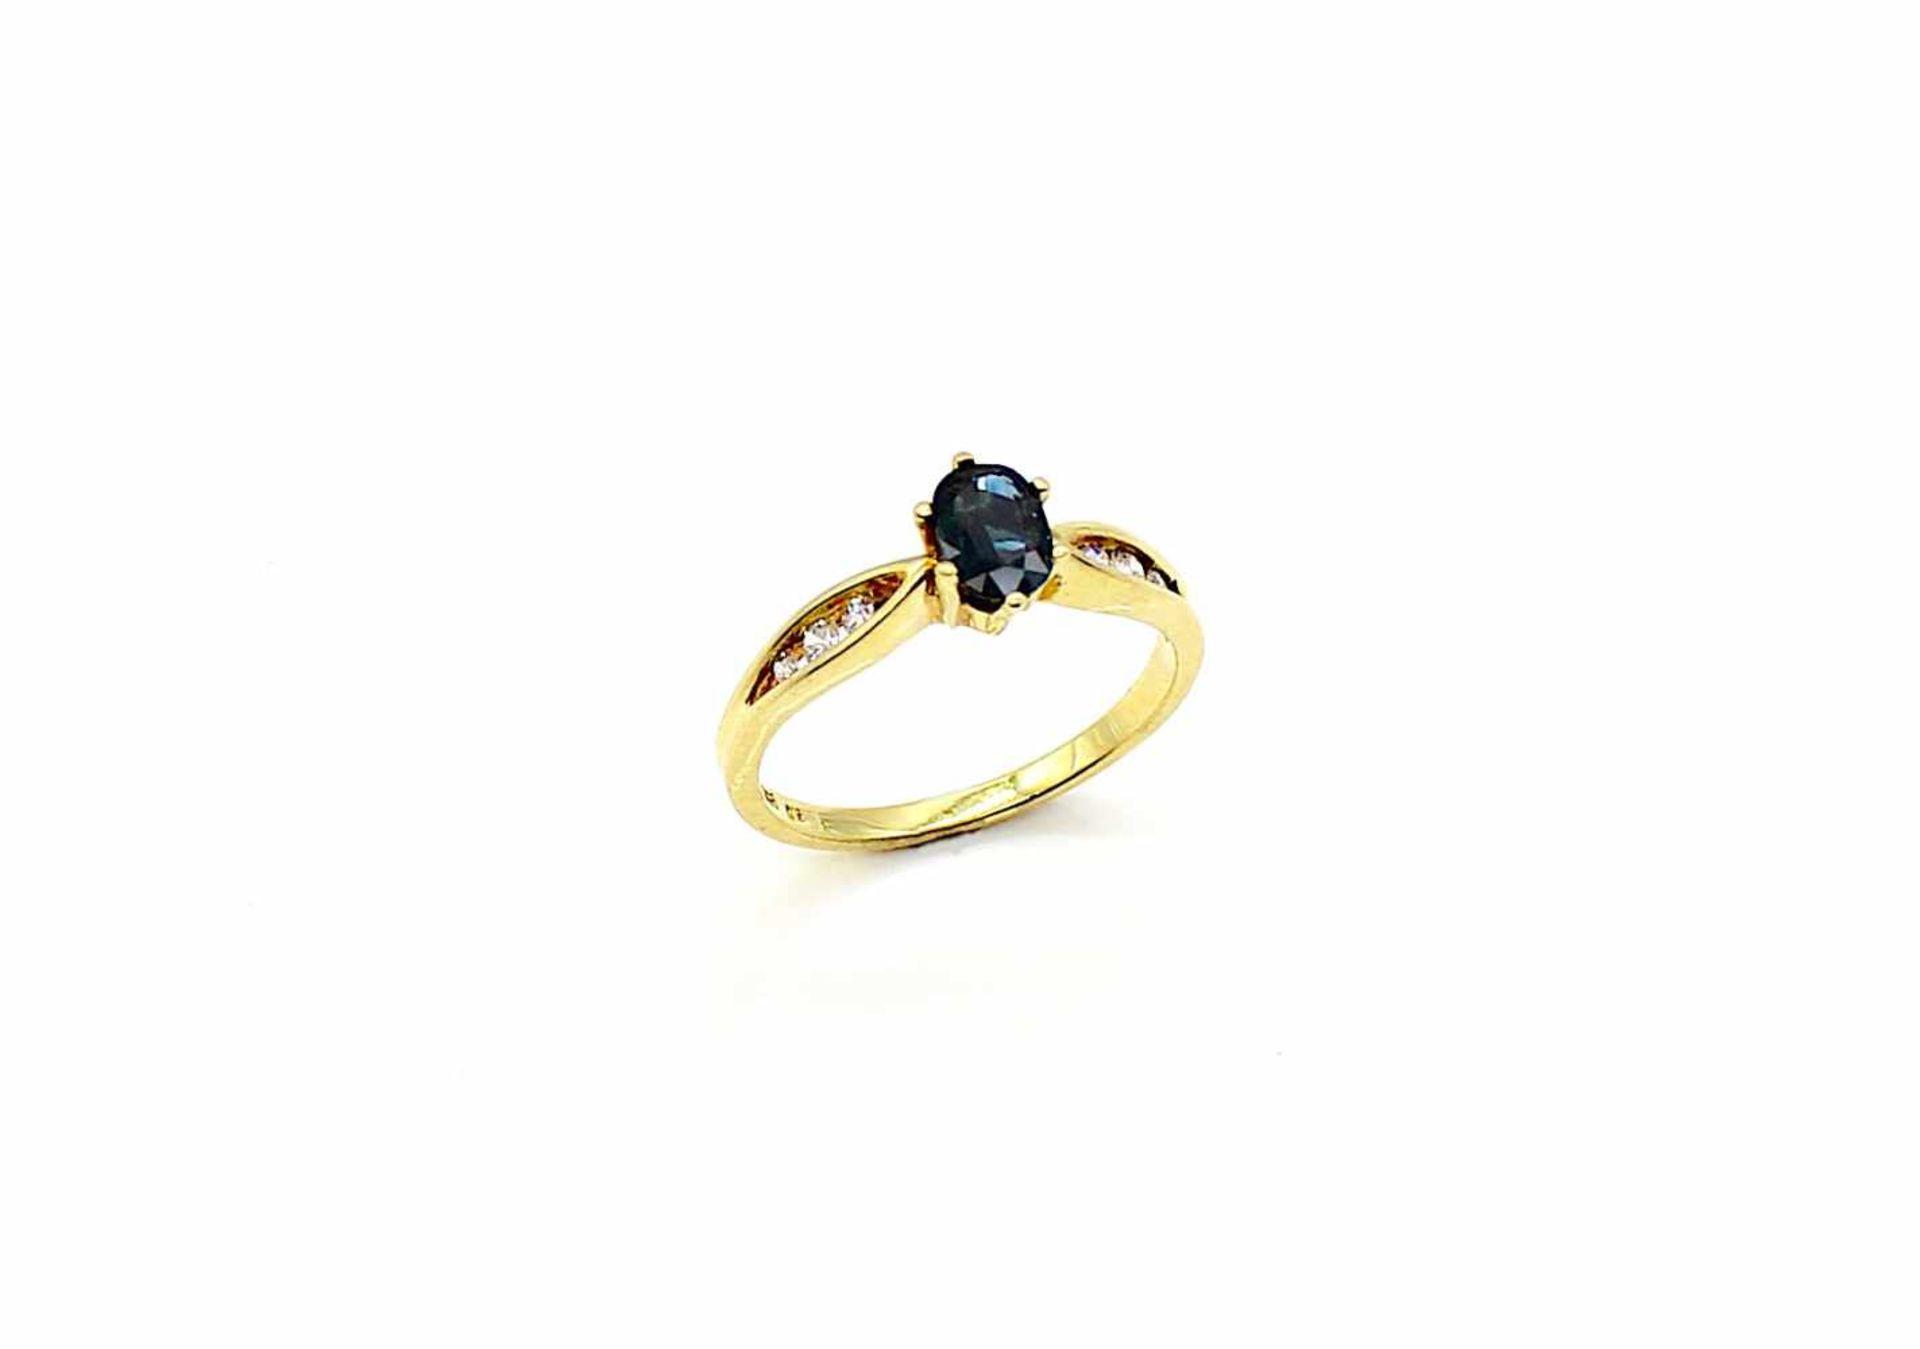 Los 36 - Ring 585 Gold mit kl. Brillanten, 1 Saphir, 2,7 g, Gr. 55